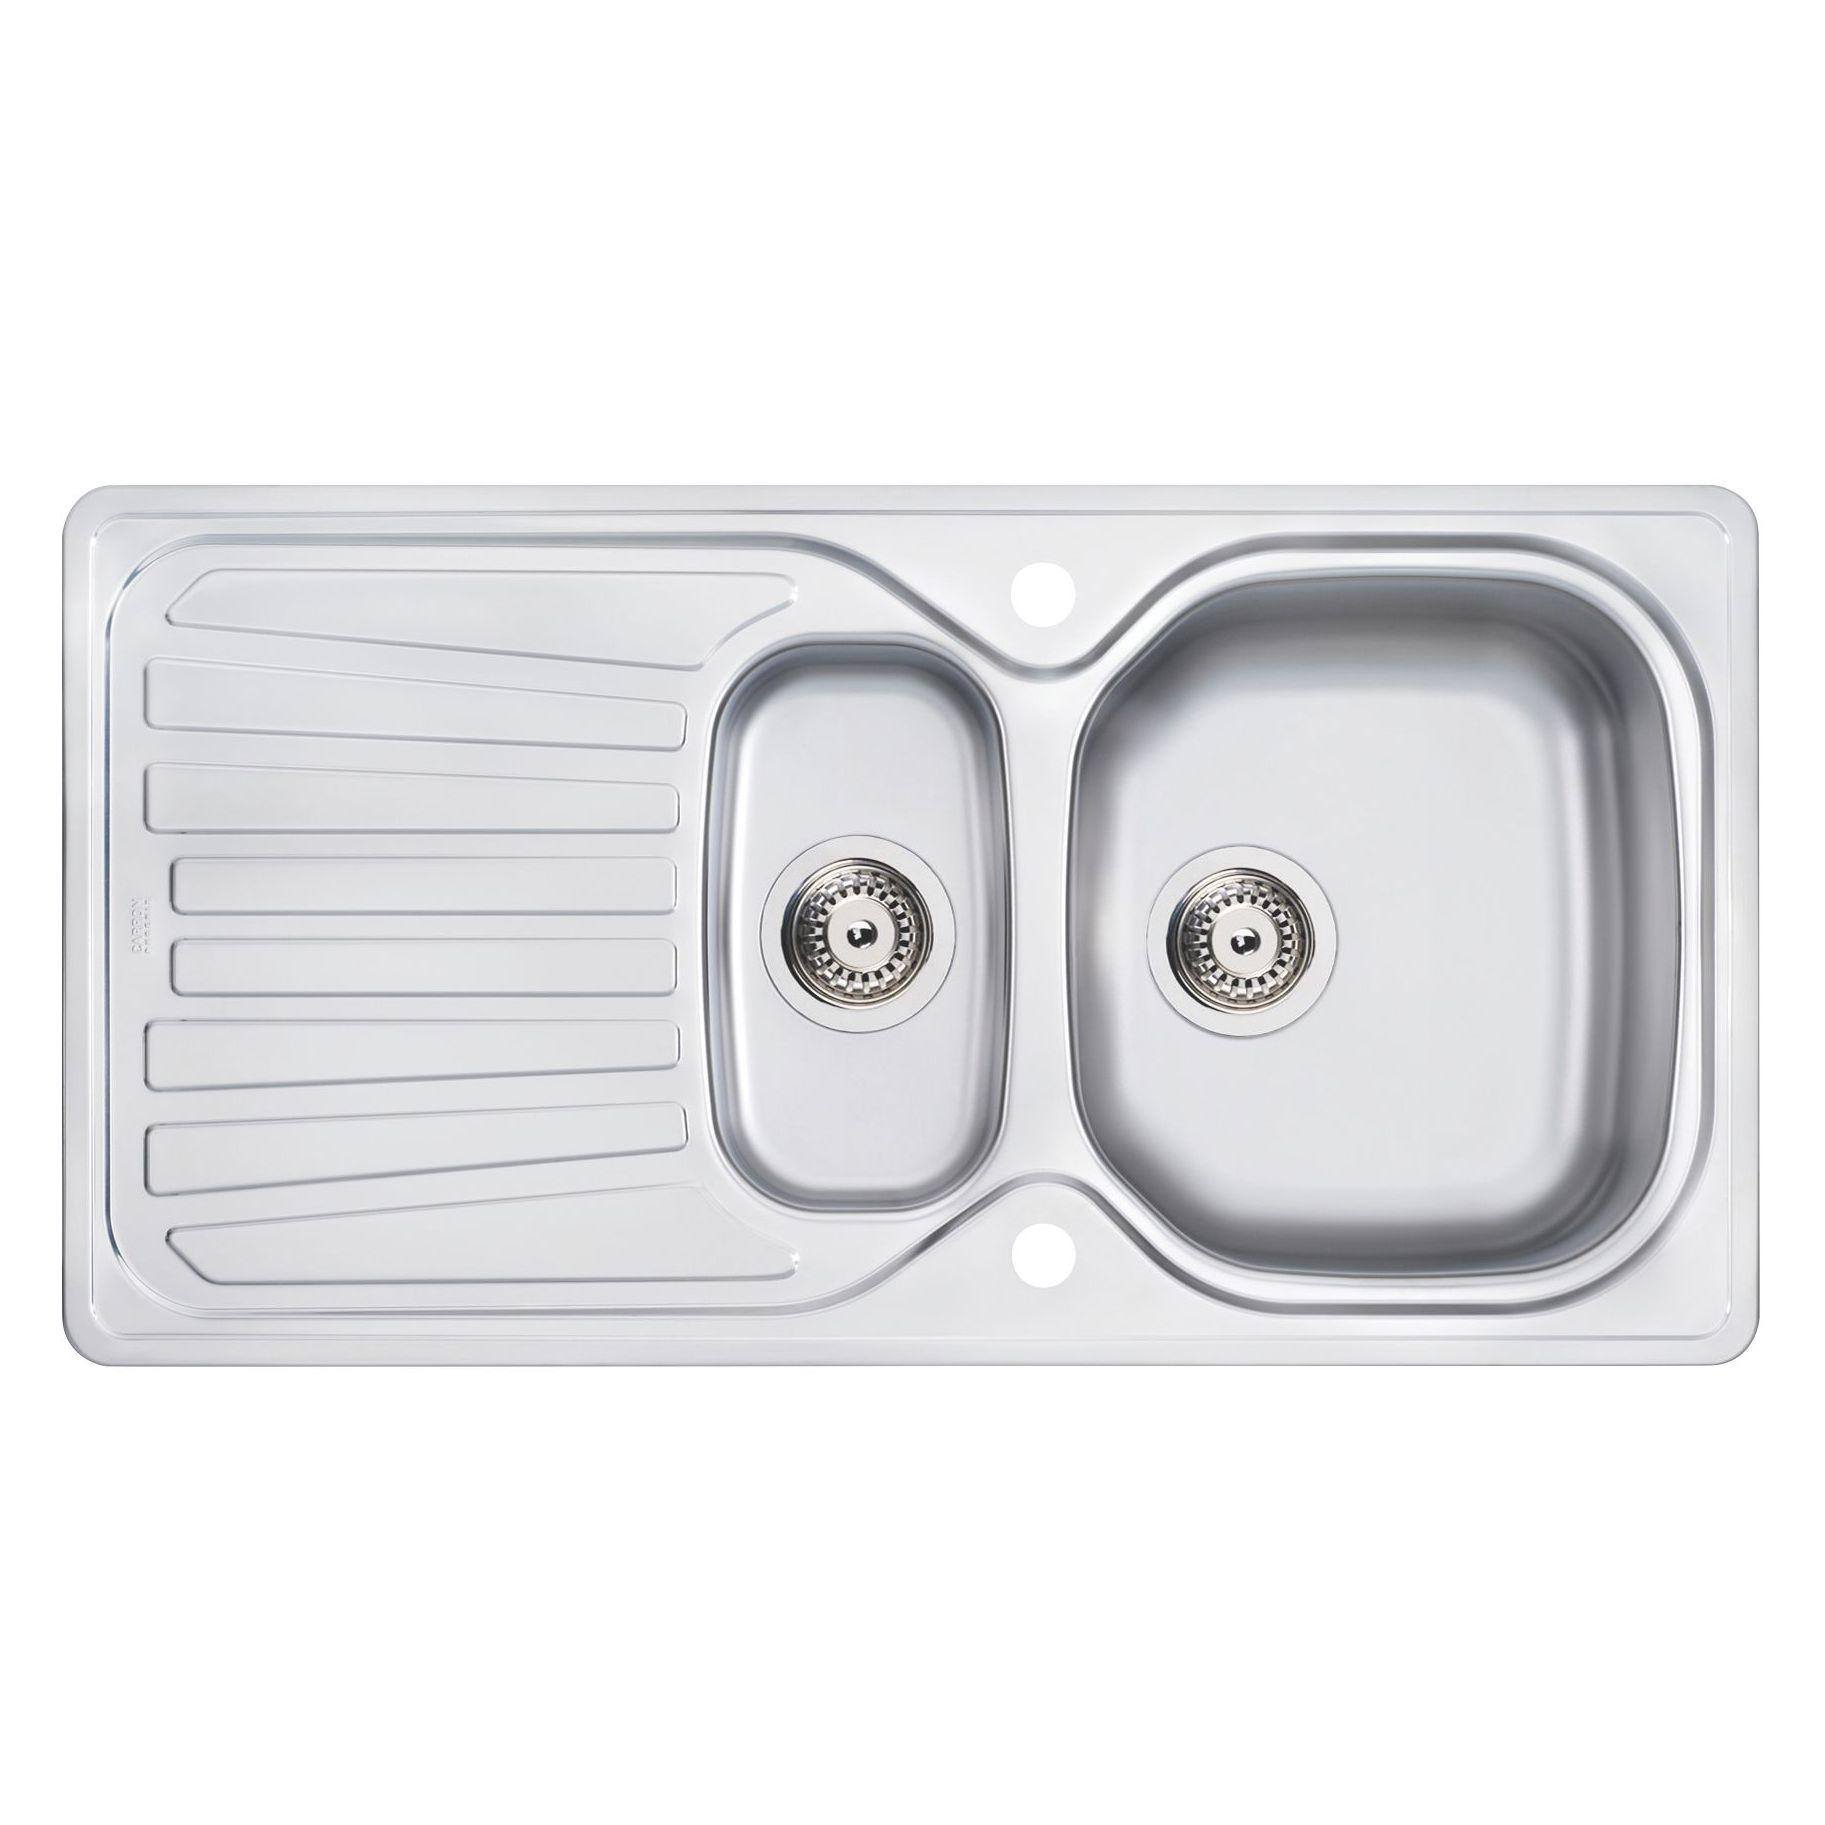 Carron Phoenix 1.5 Bowl Stainless Steel Sink | Departments | DIY ...